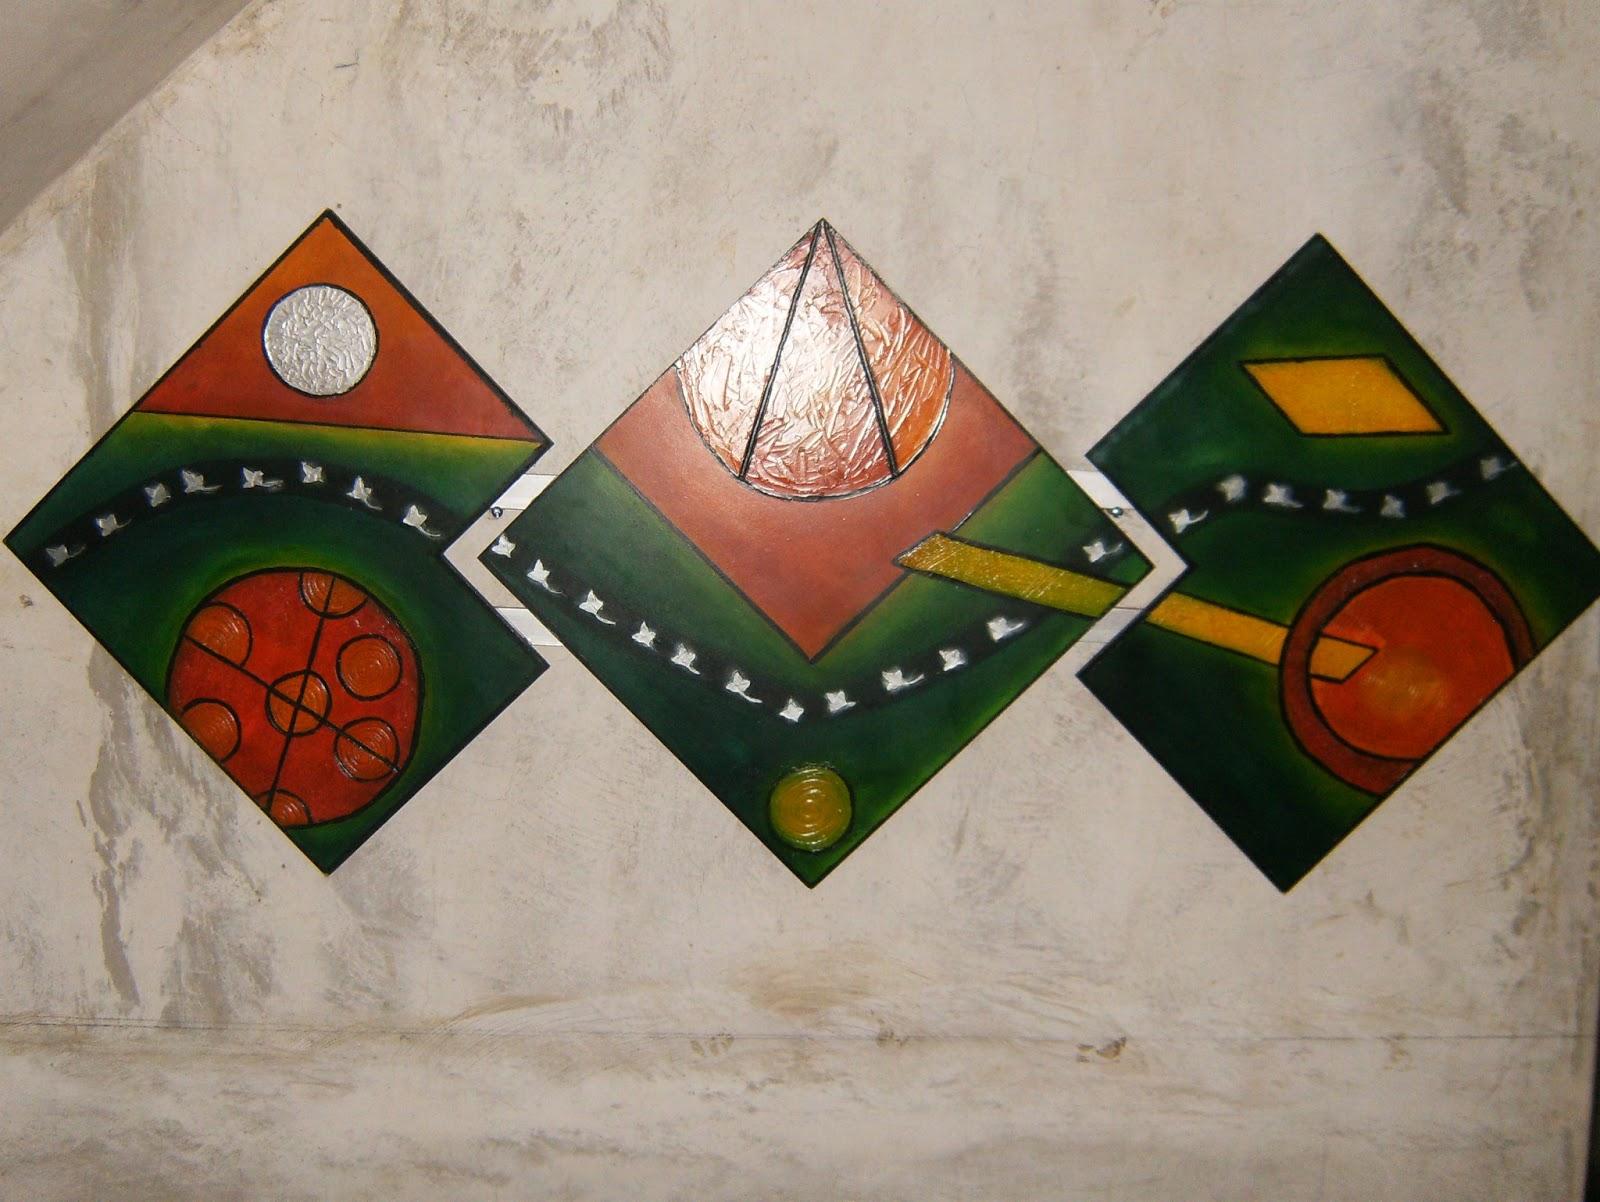 Todoarte cuadros con texturas - Cuadros con texturas abstractos ...